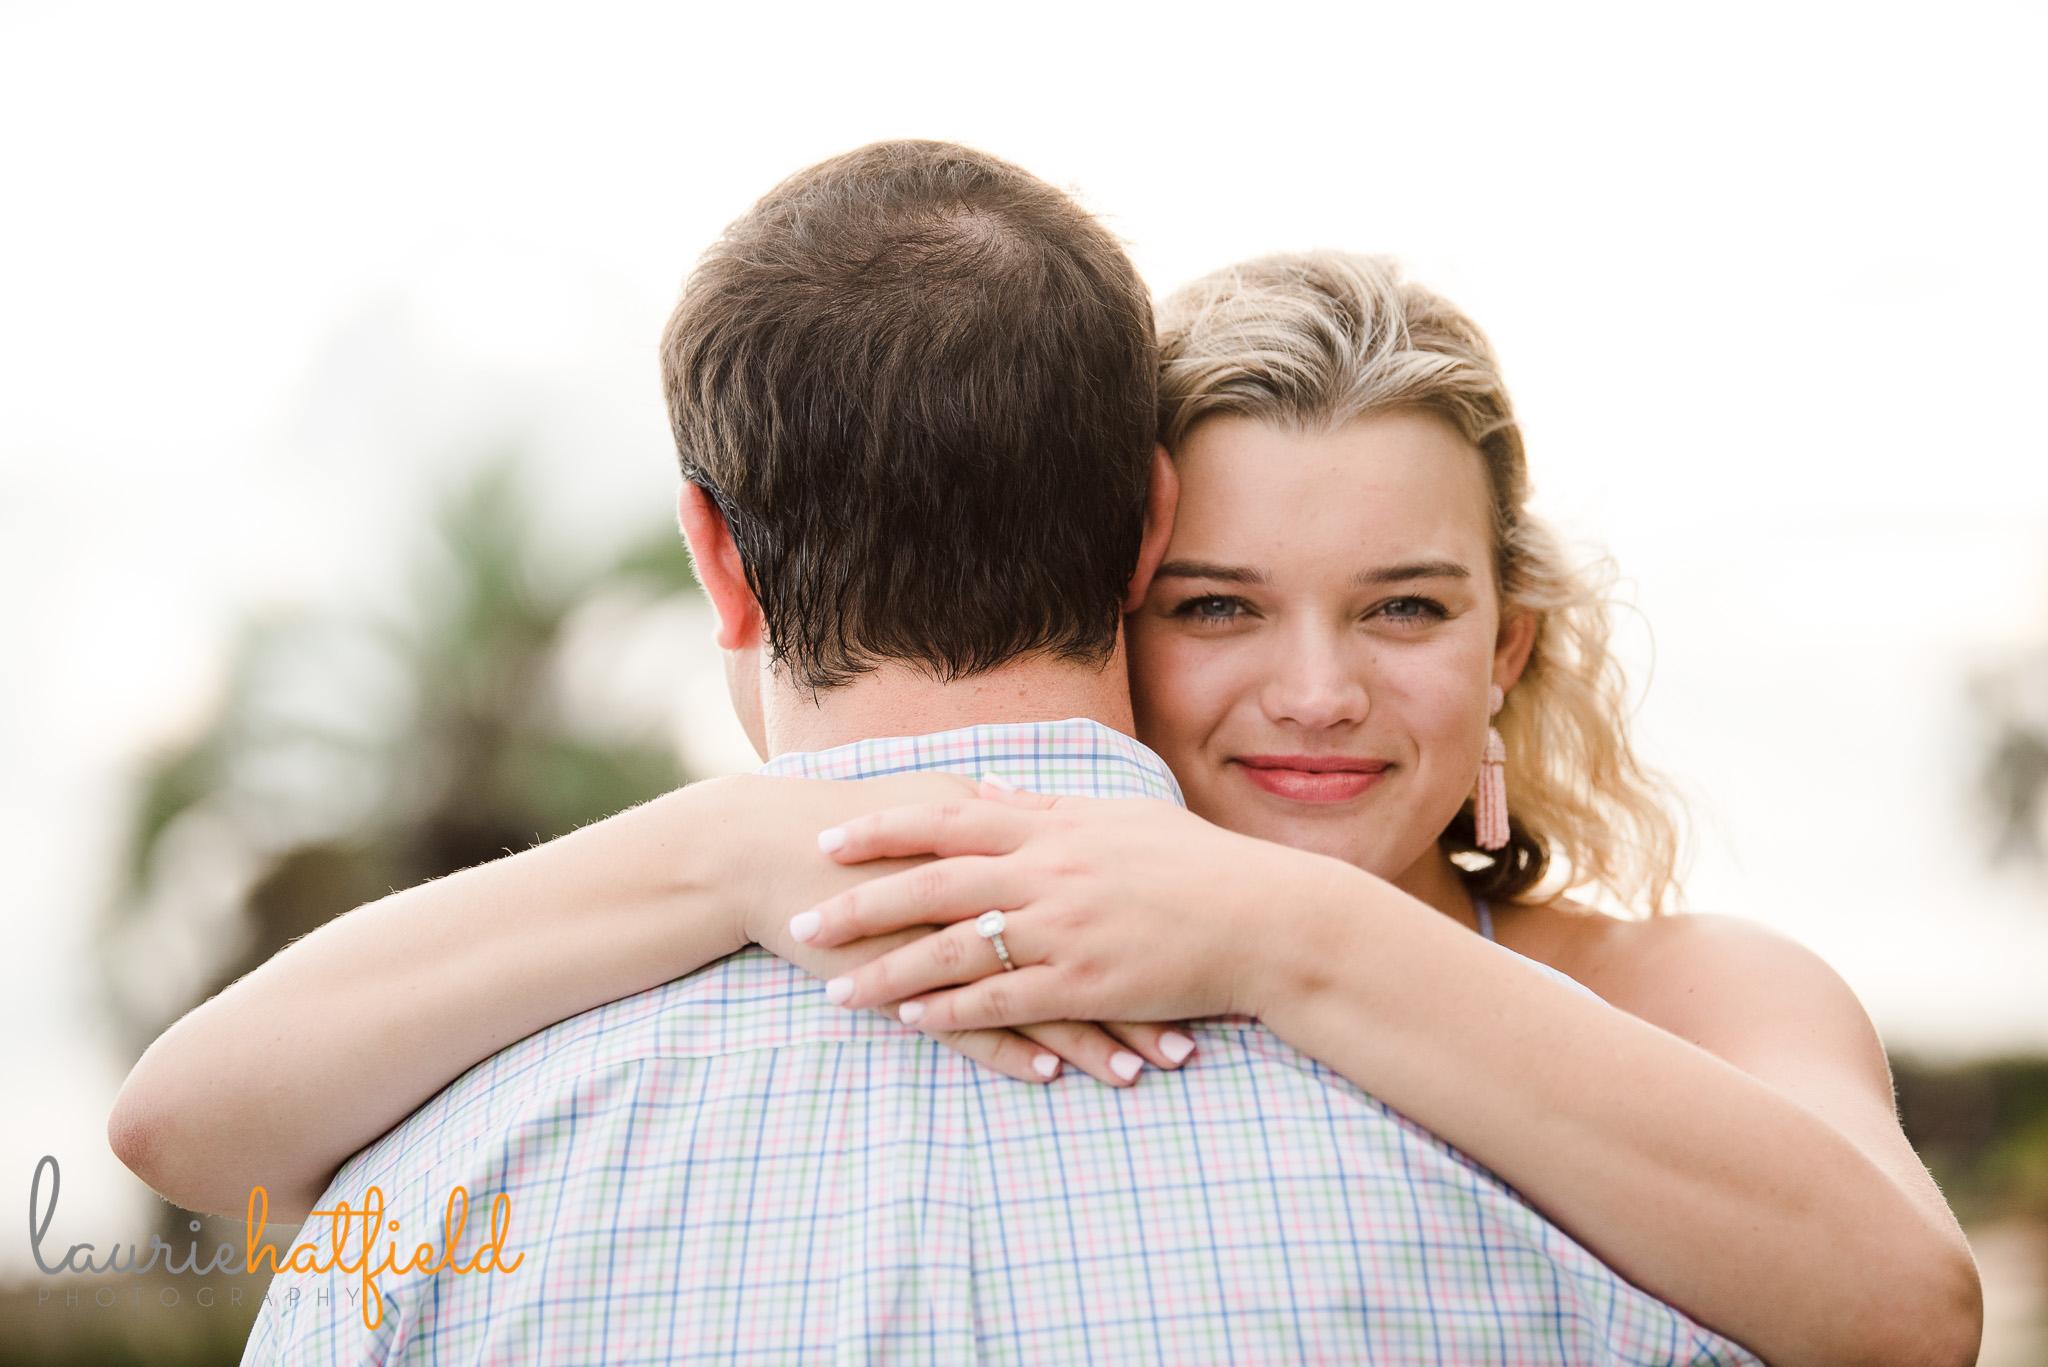 engagement photo session Fairhope AL | Mobile proposal photographer